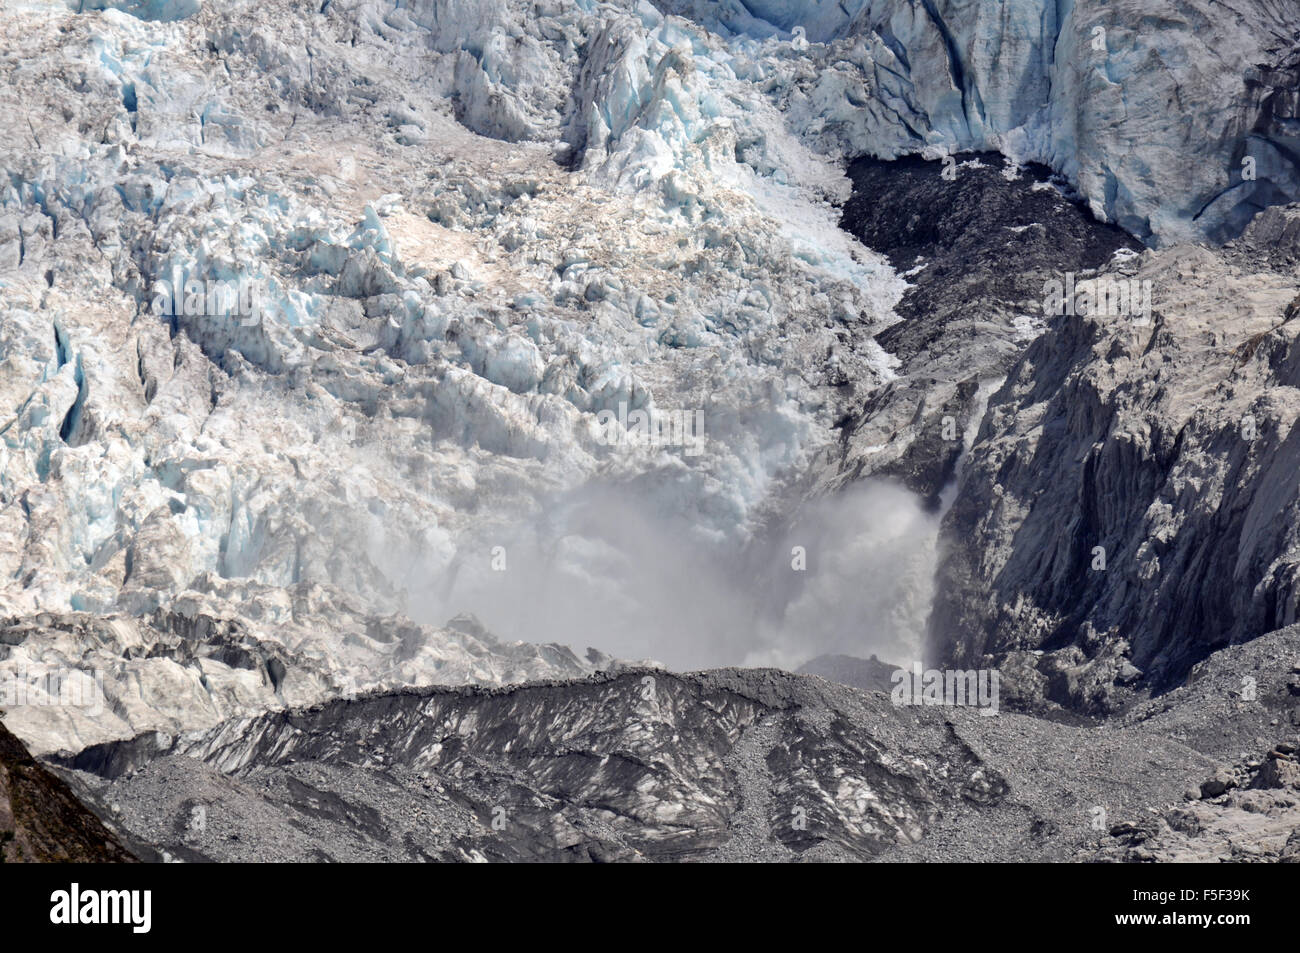 Schmelzpunkt bei Franz Josef Glacier, Franz Josef, Südinsel, Neuseeland Stockbild